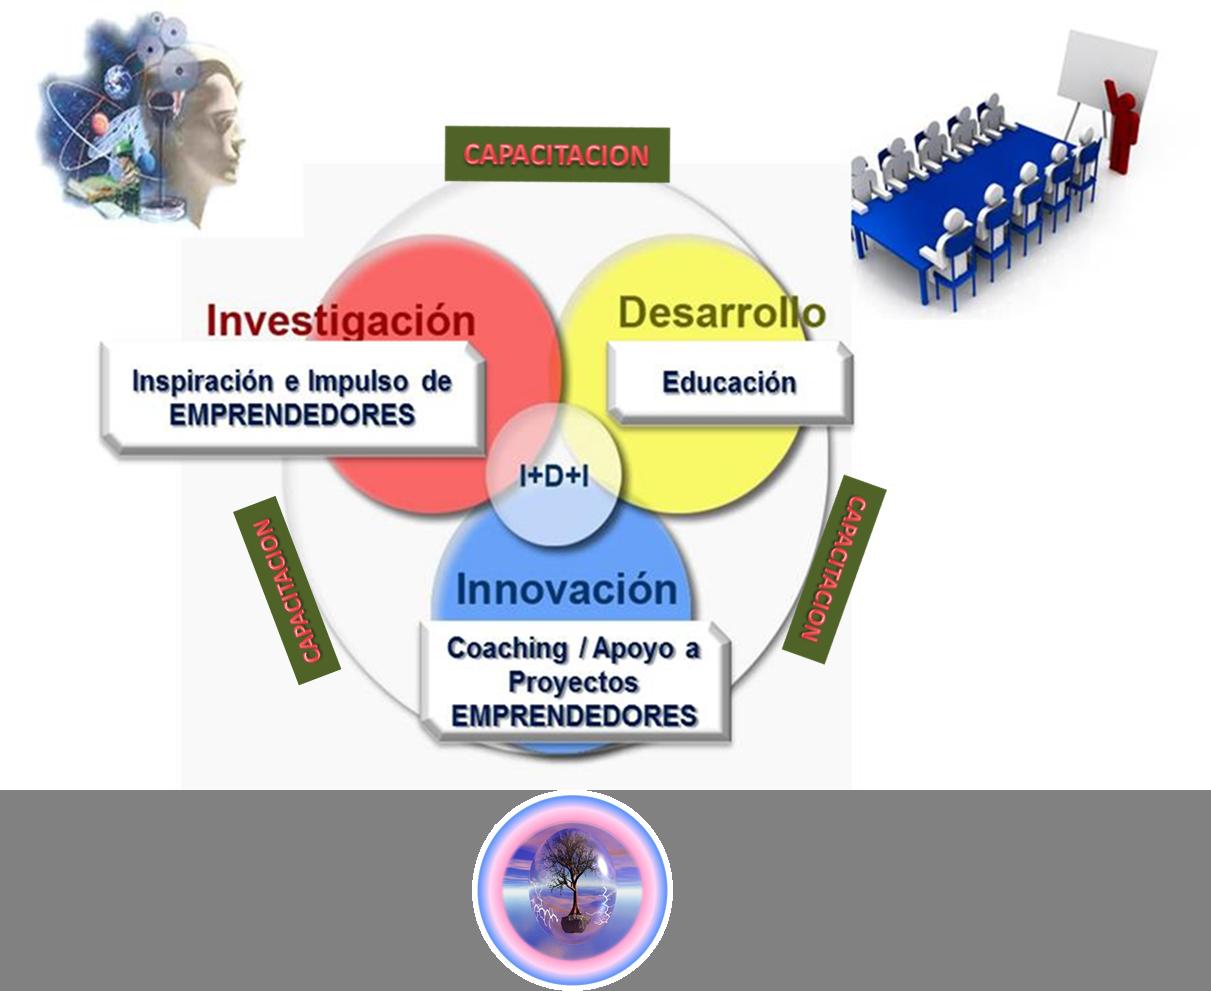 investigacin_desarroollo